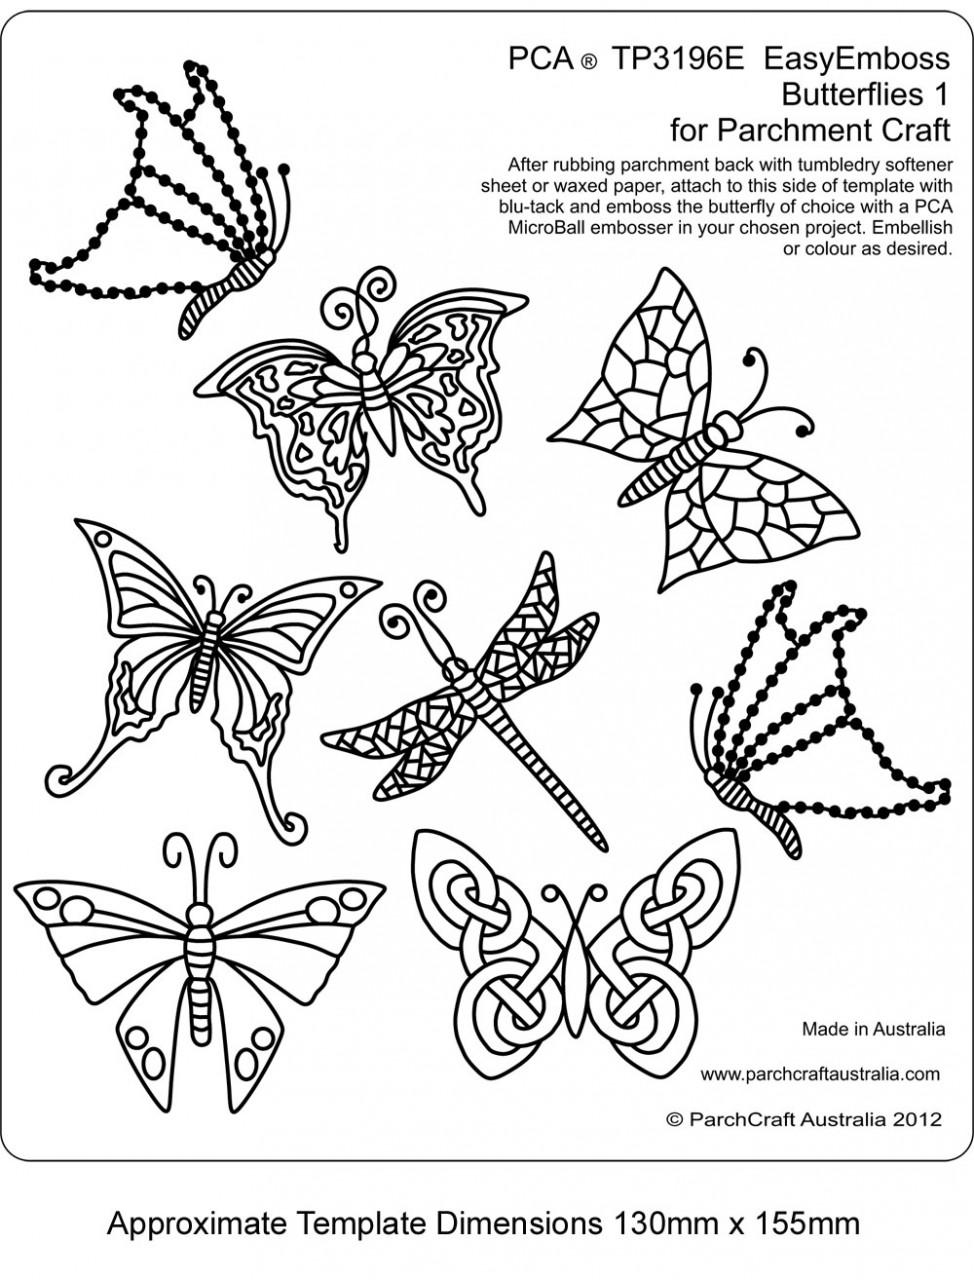 PCA Embossing Easy Emboss Butterflies 1 TP3196E - Card Making ...